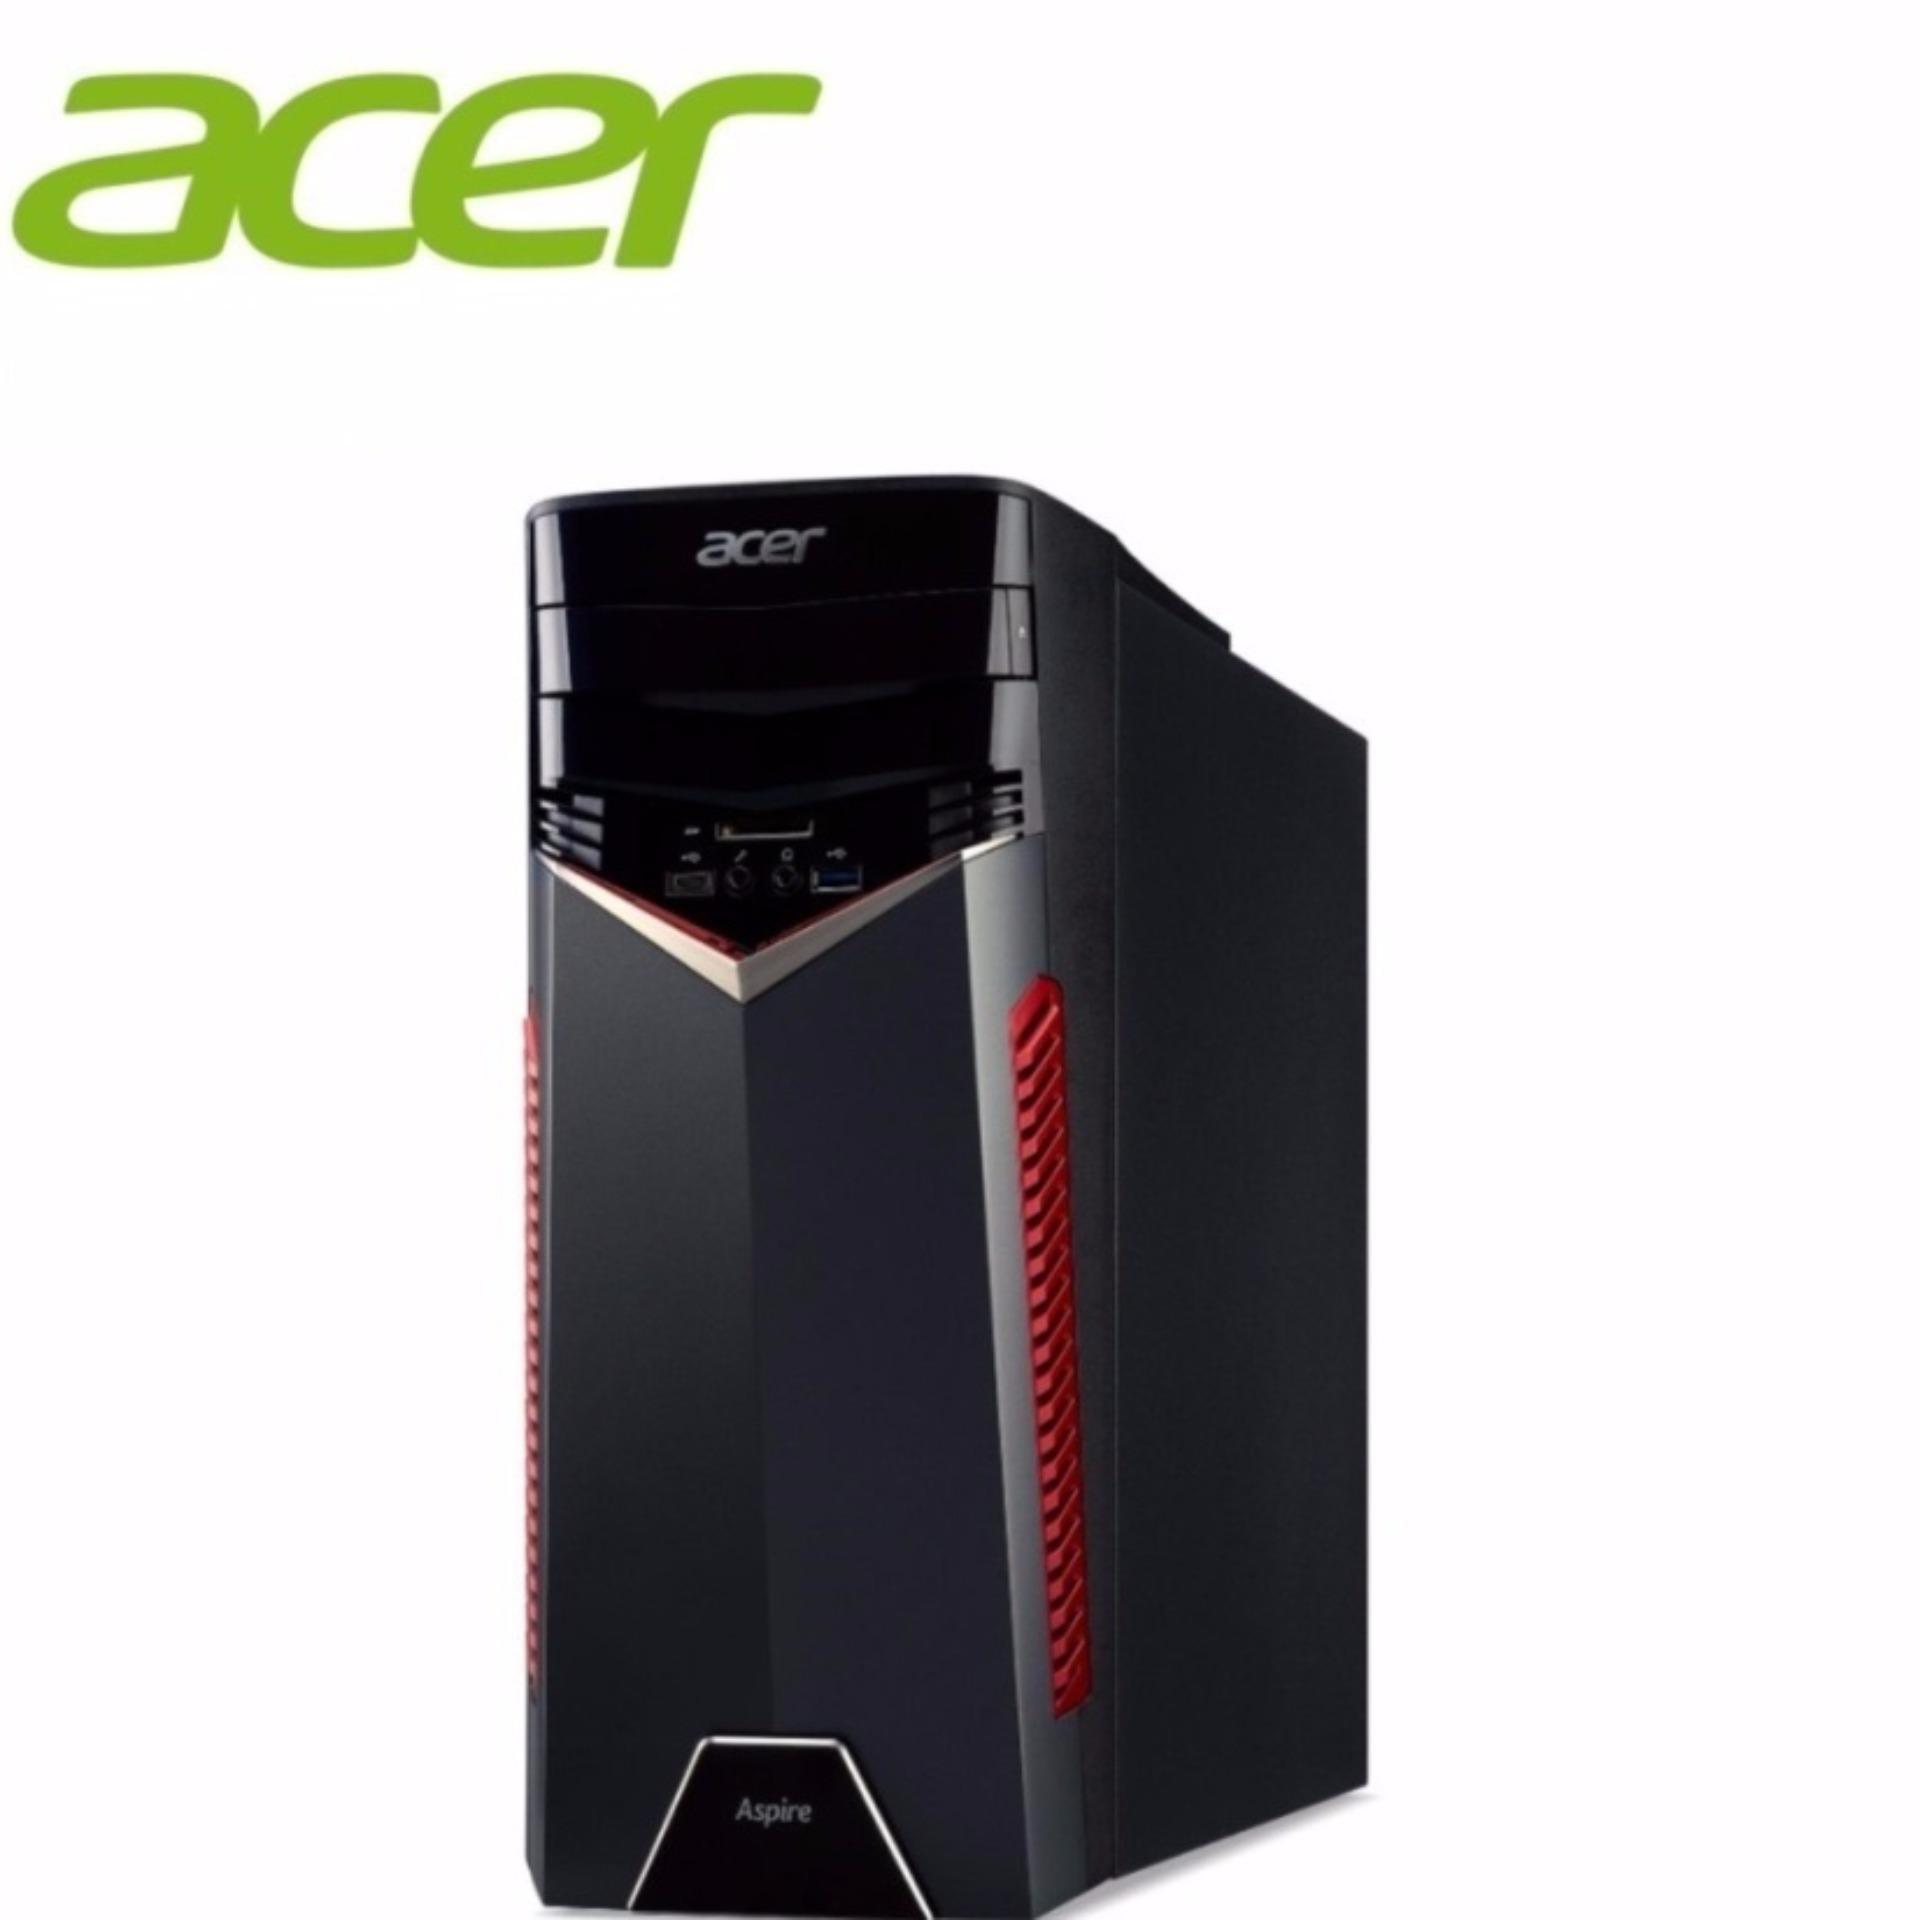 Acer Aspire GX-781 (i740MR81T05) 8GB RAM/1TB HDD Gaming Desktop (Black) – DT.B88SG.003